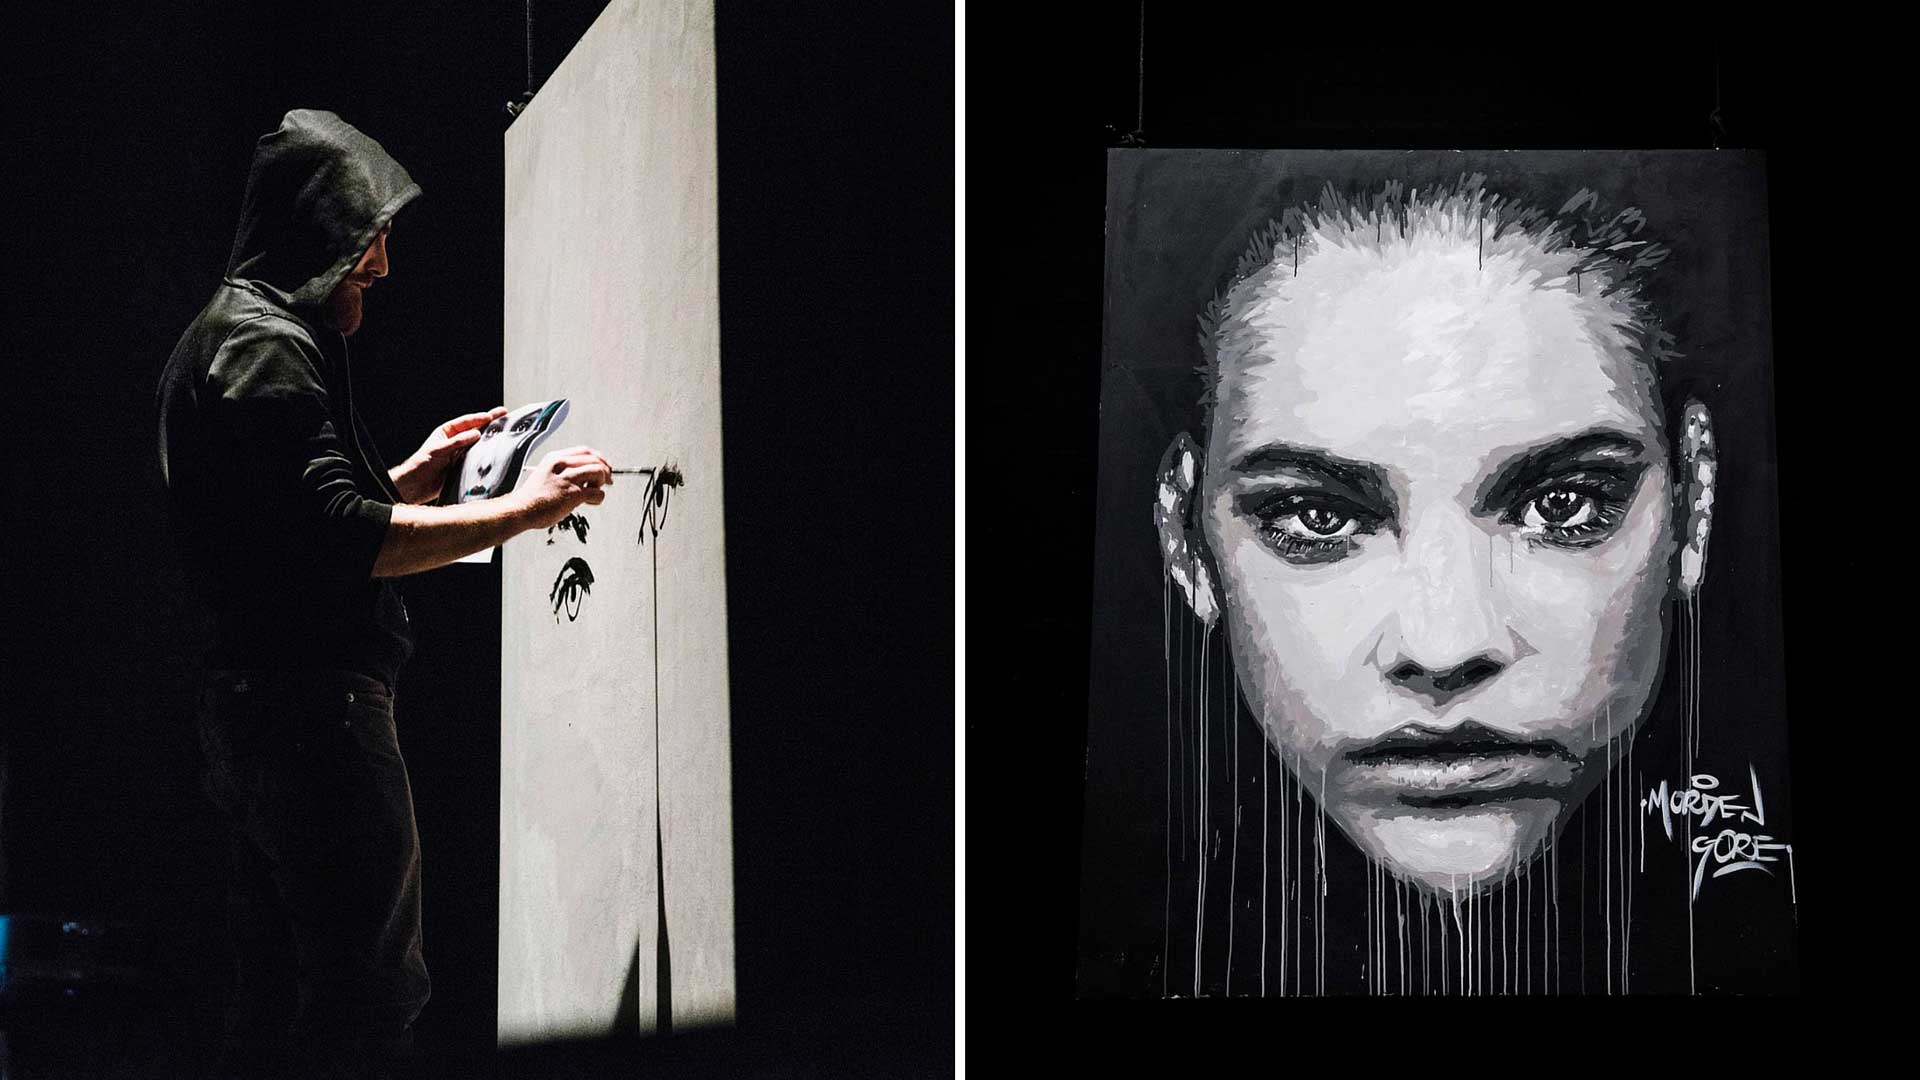 macerata, street art, morden gore